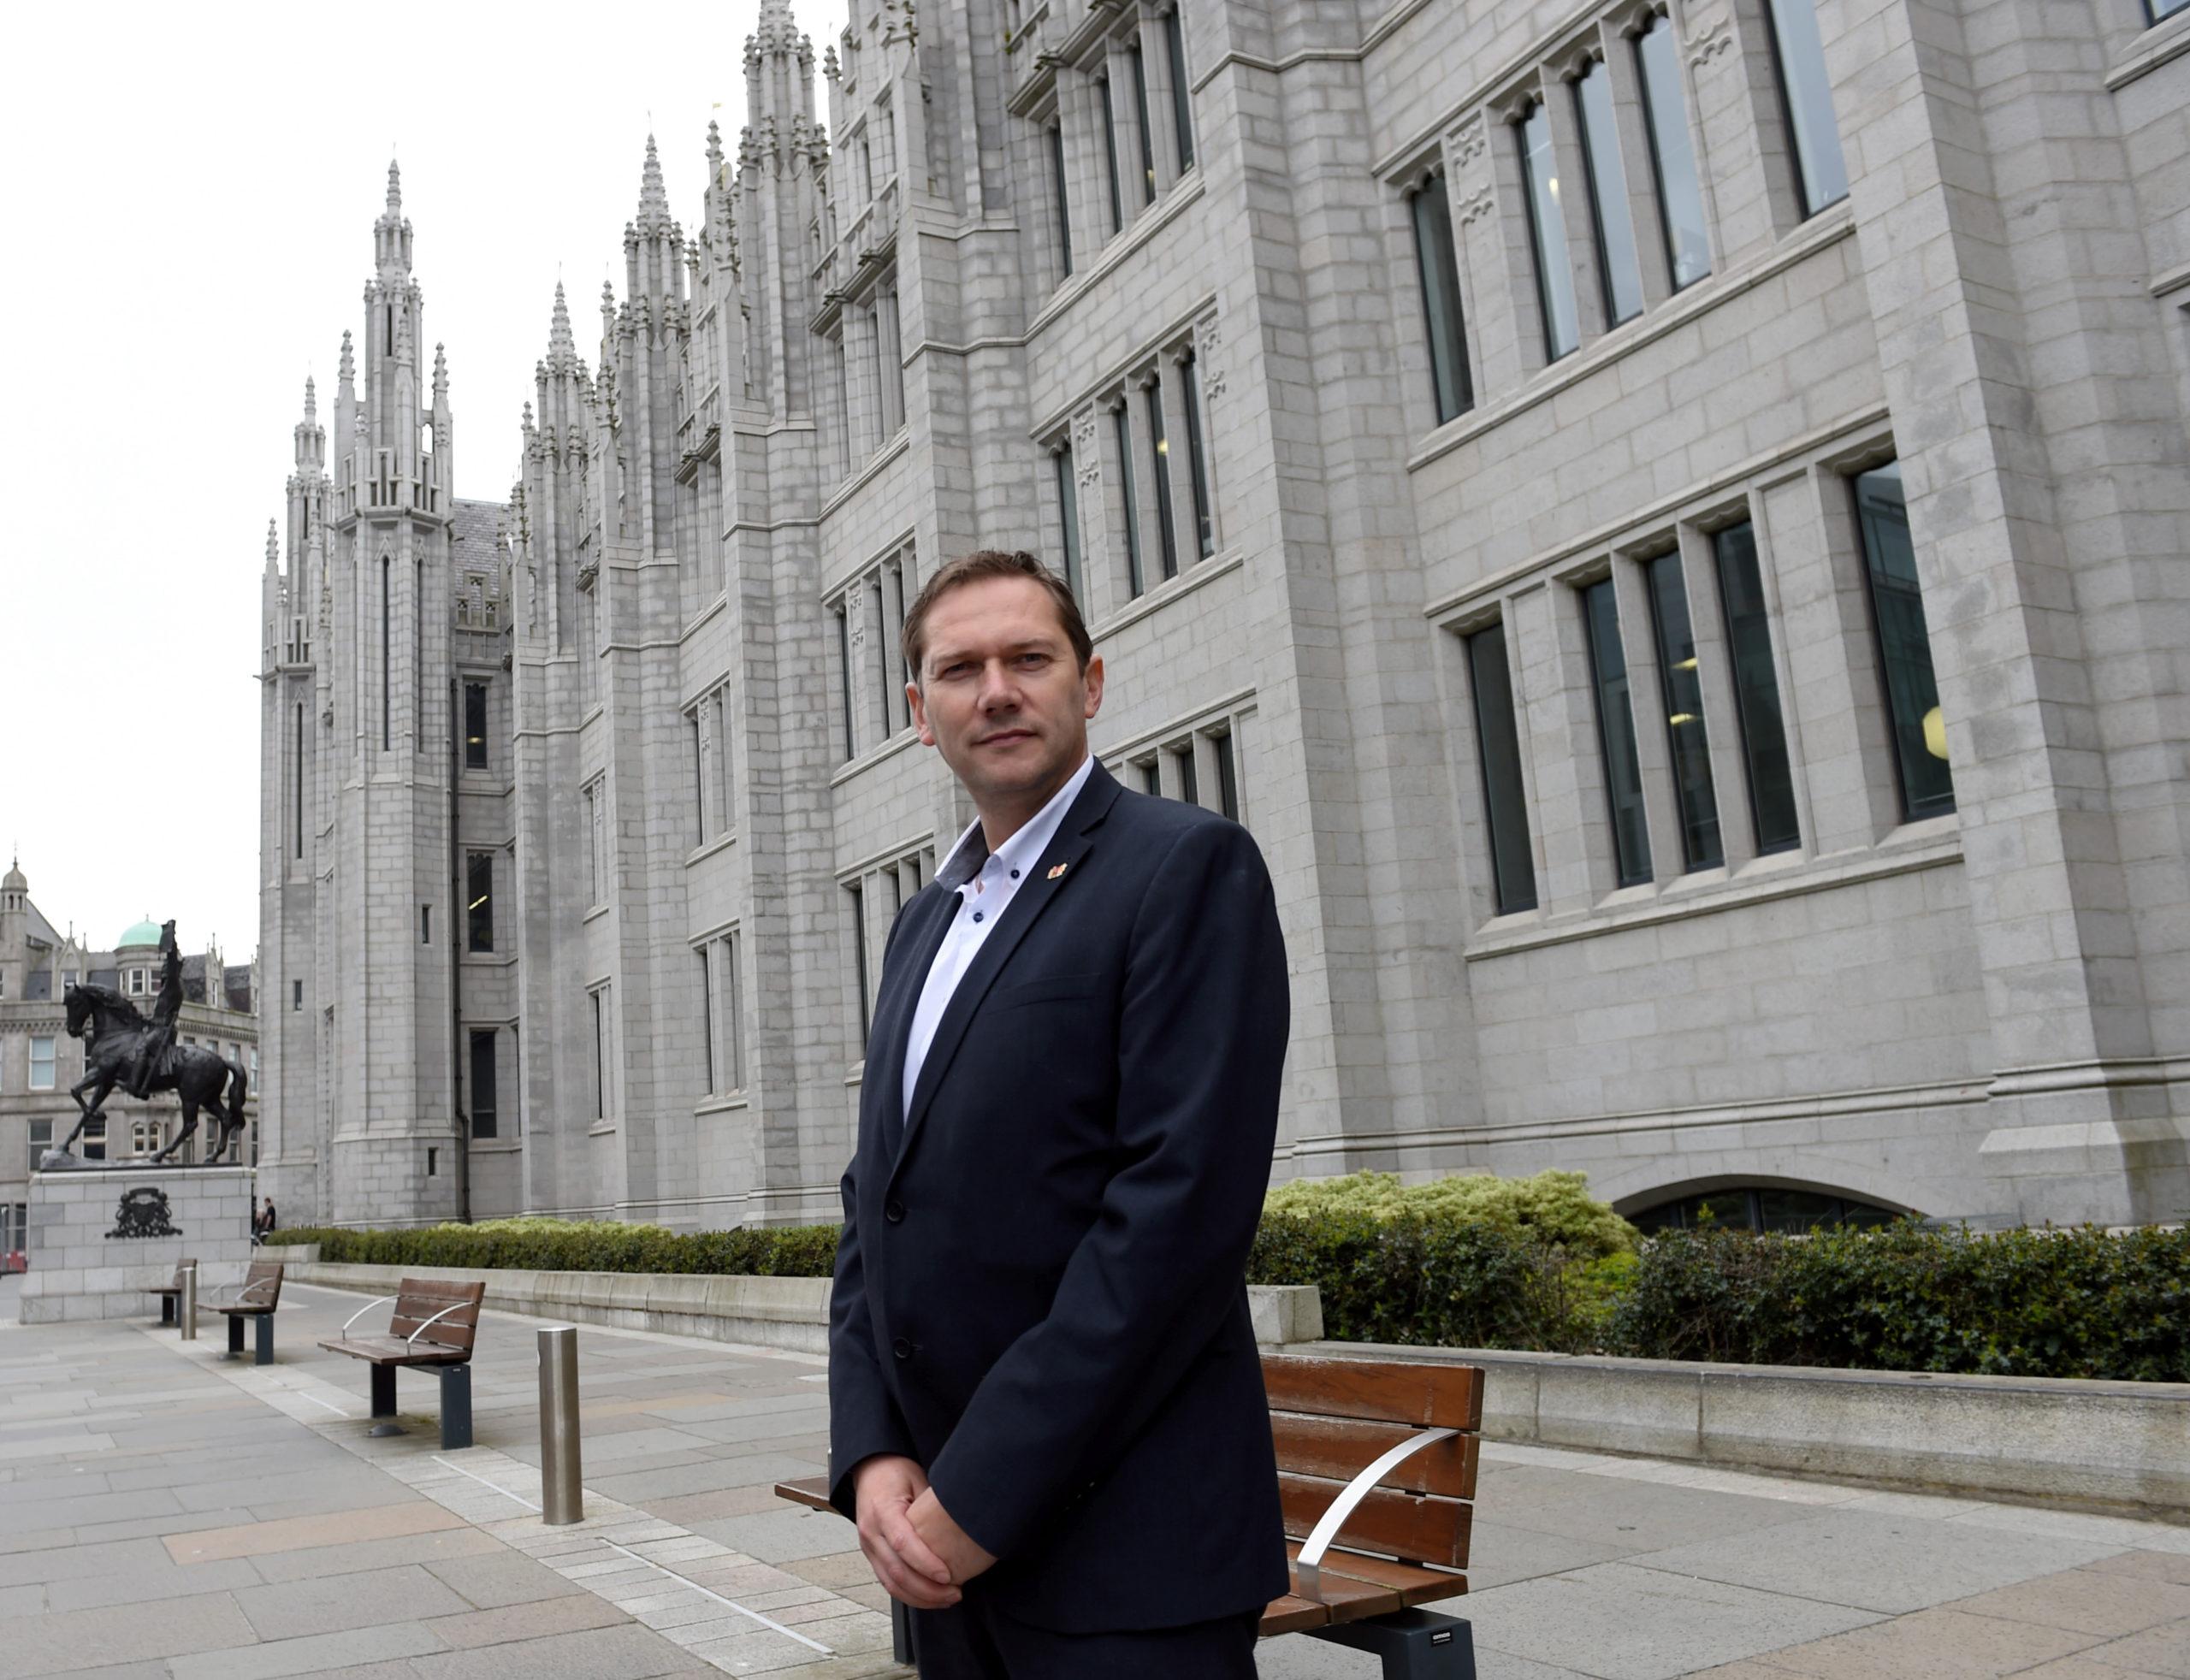 Aberdeen City Council co-leader Douglas Lumsden. Picture by Darrell Benns